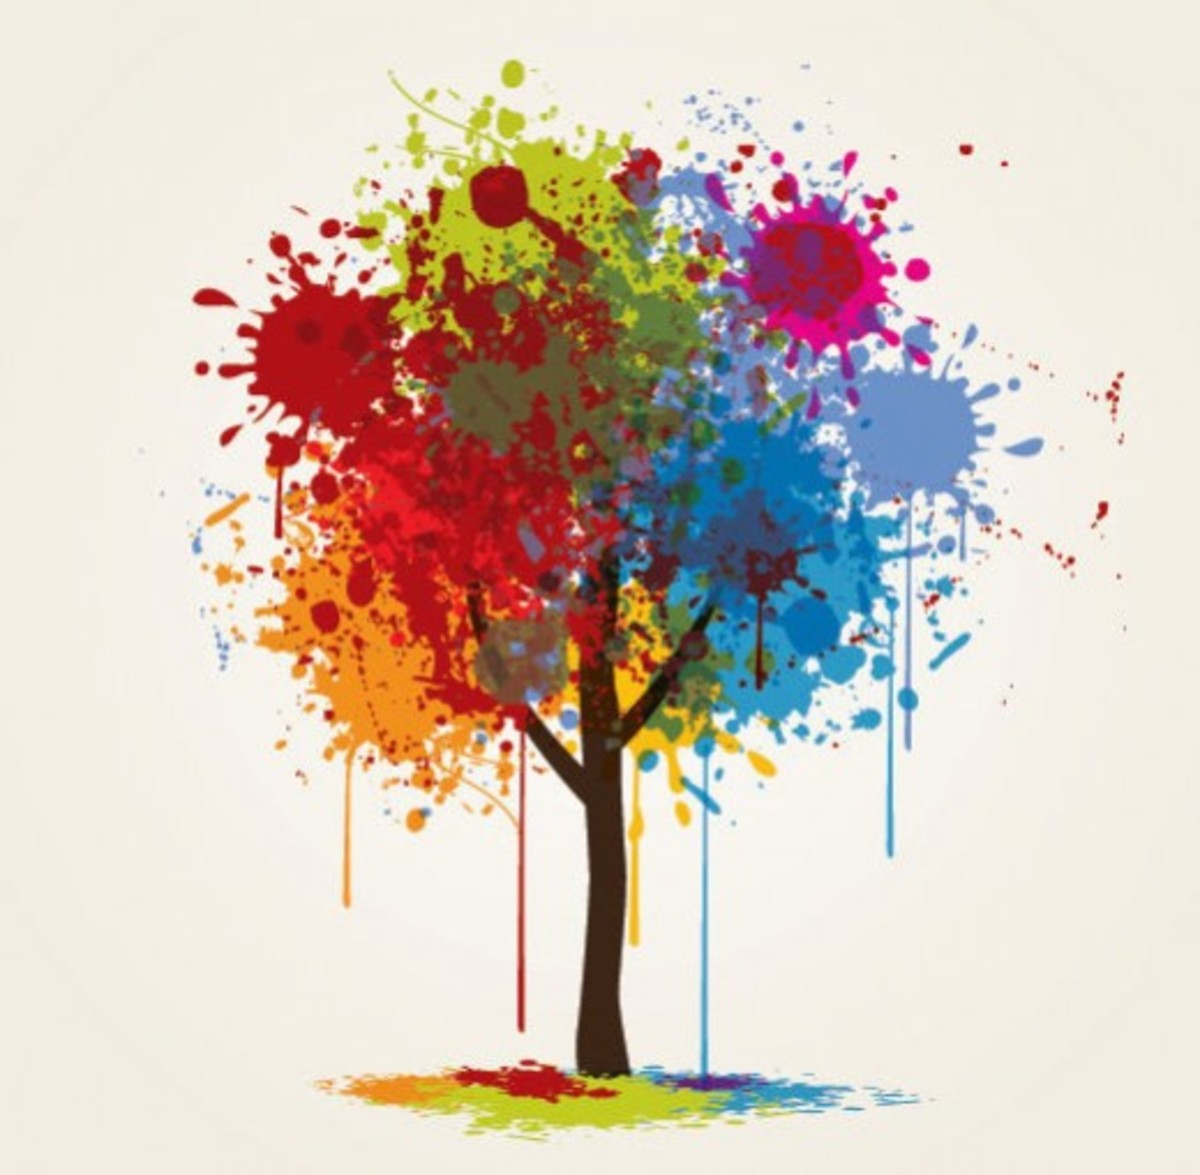 Paint Drip Tree